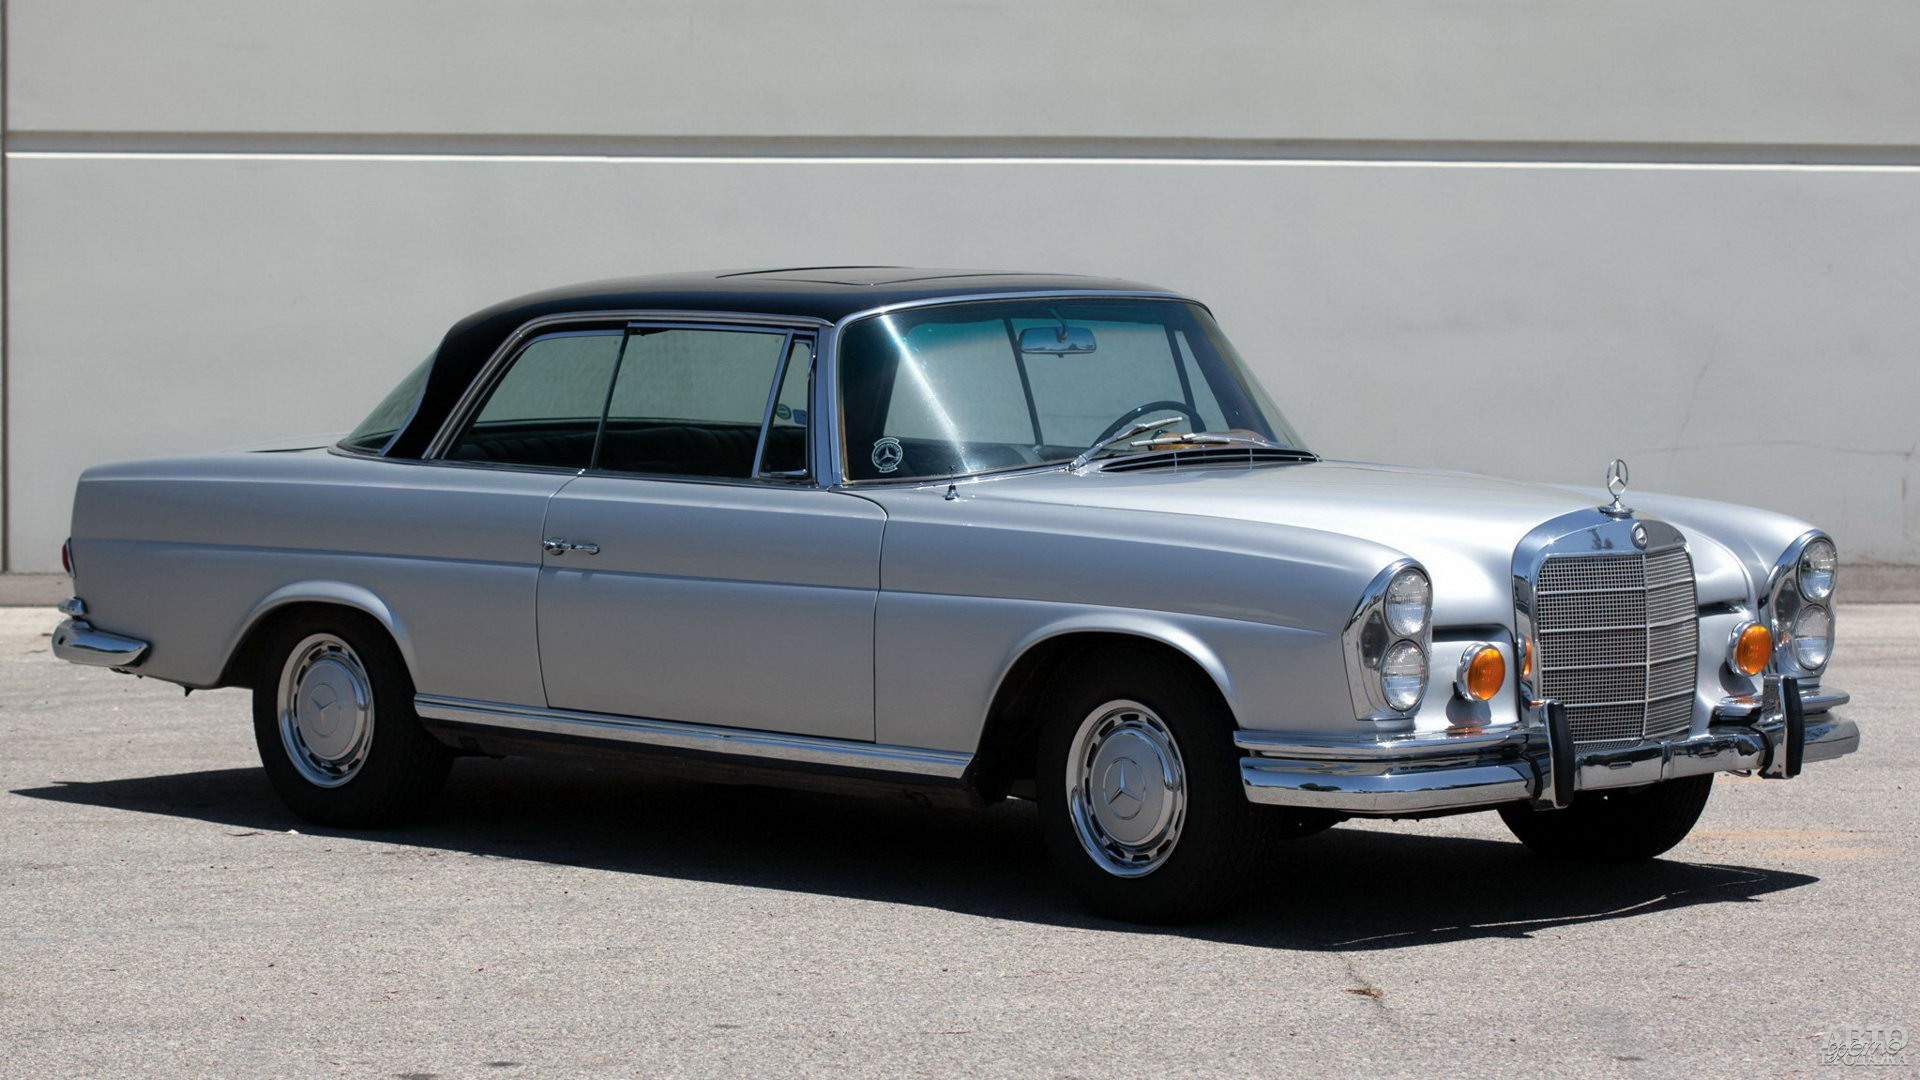 Mеrcedes-Benz 300 SE Coupe (W112) 1962 года